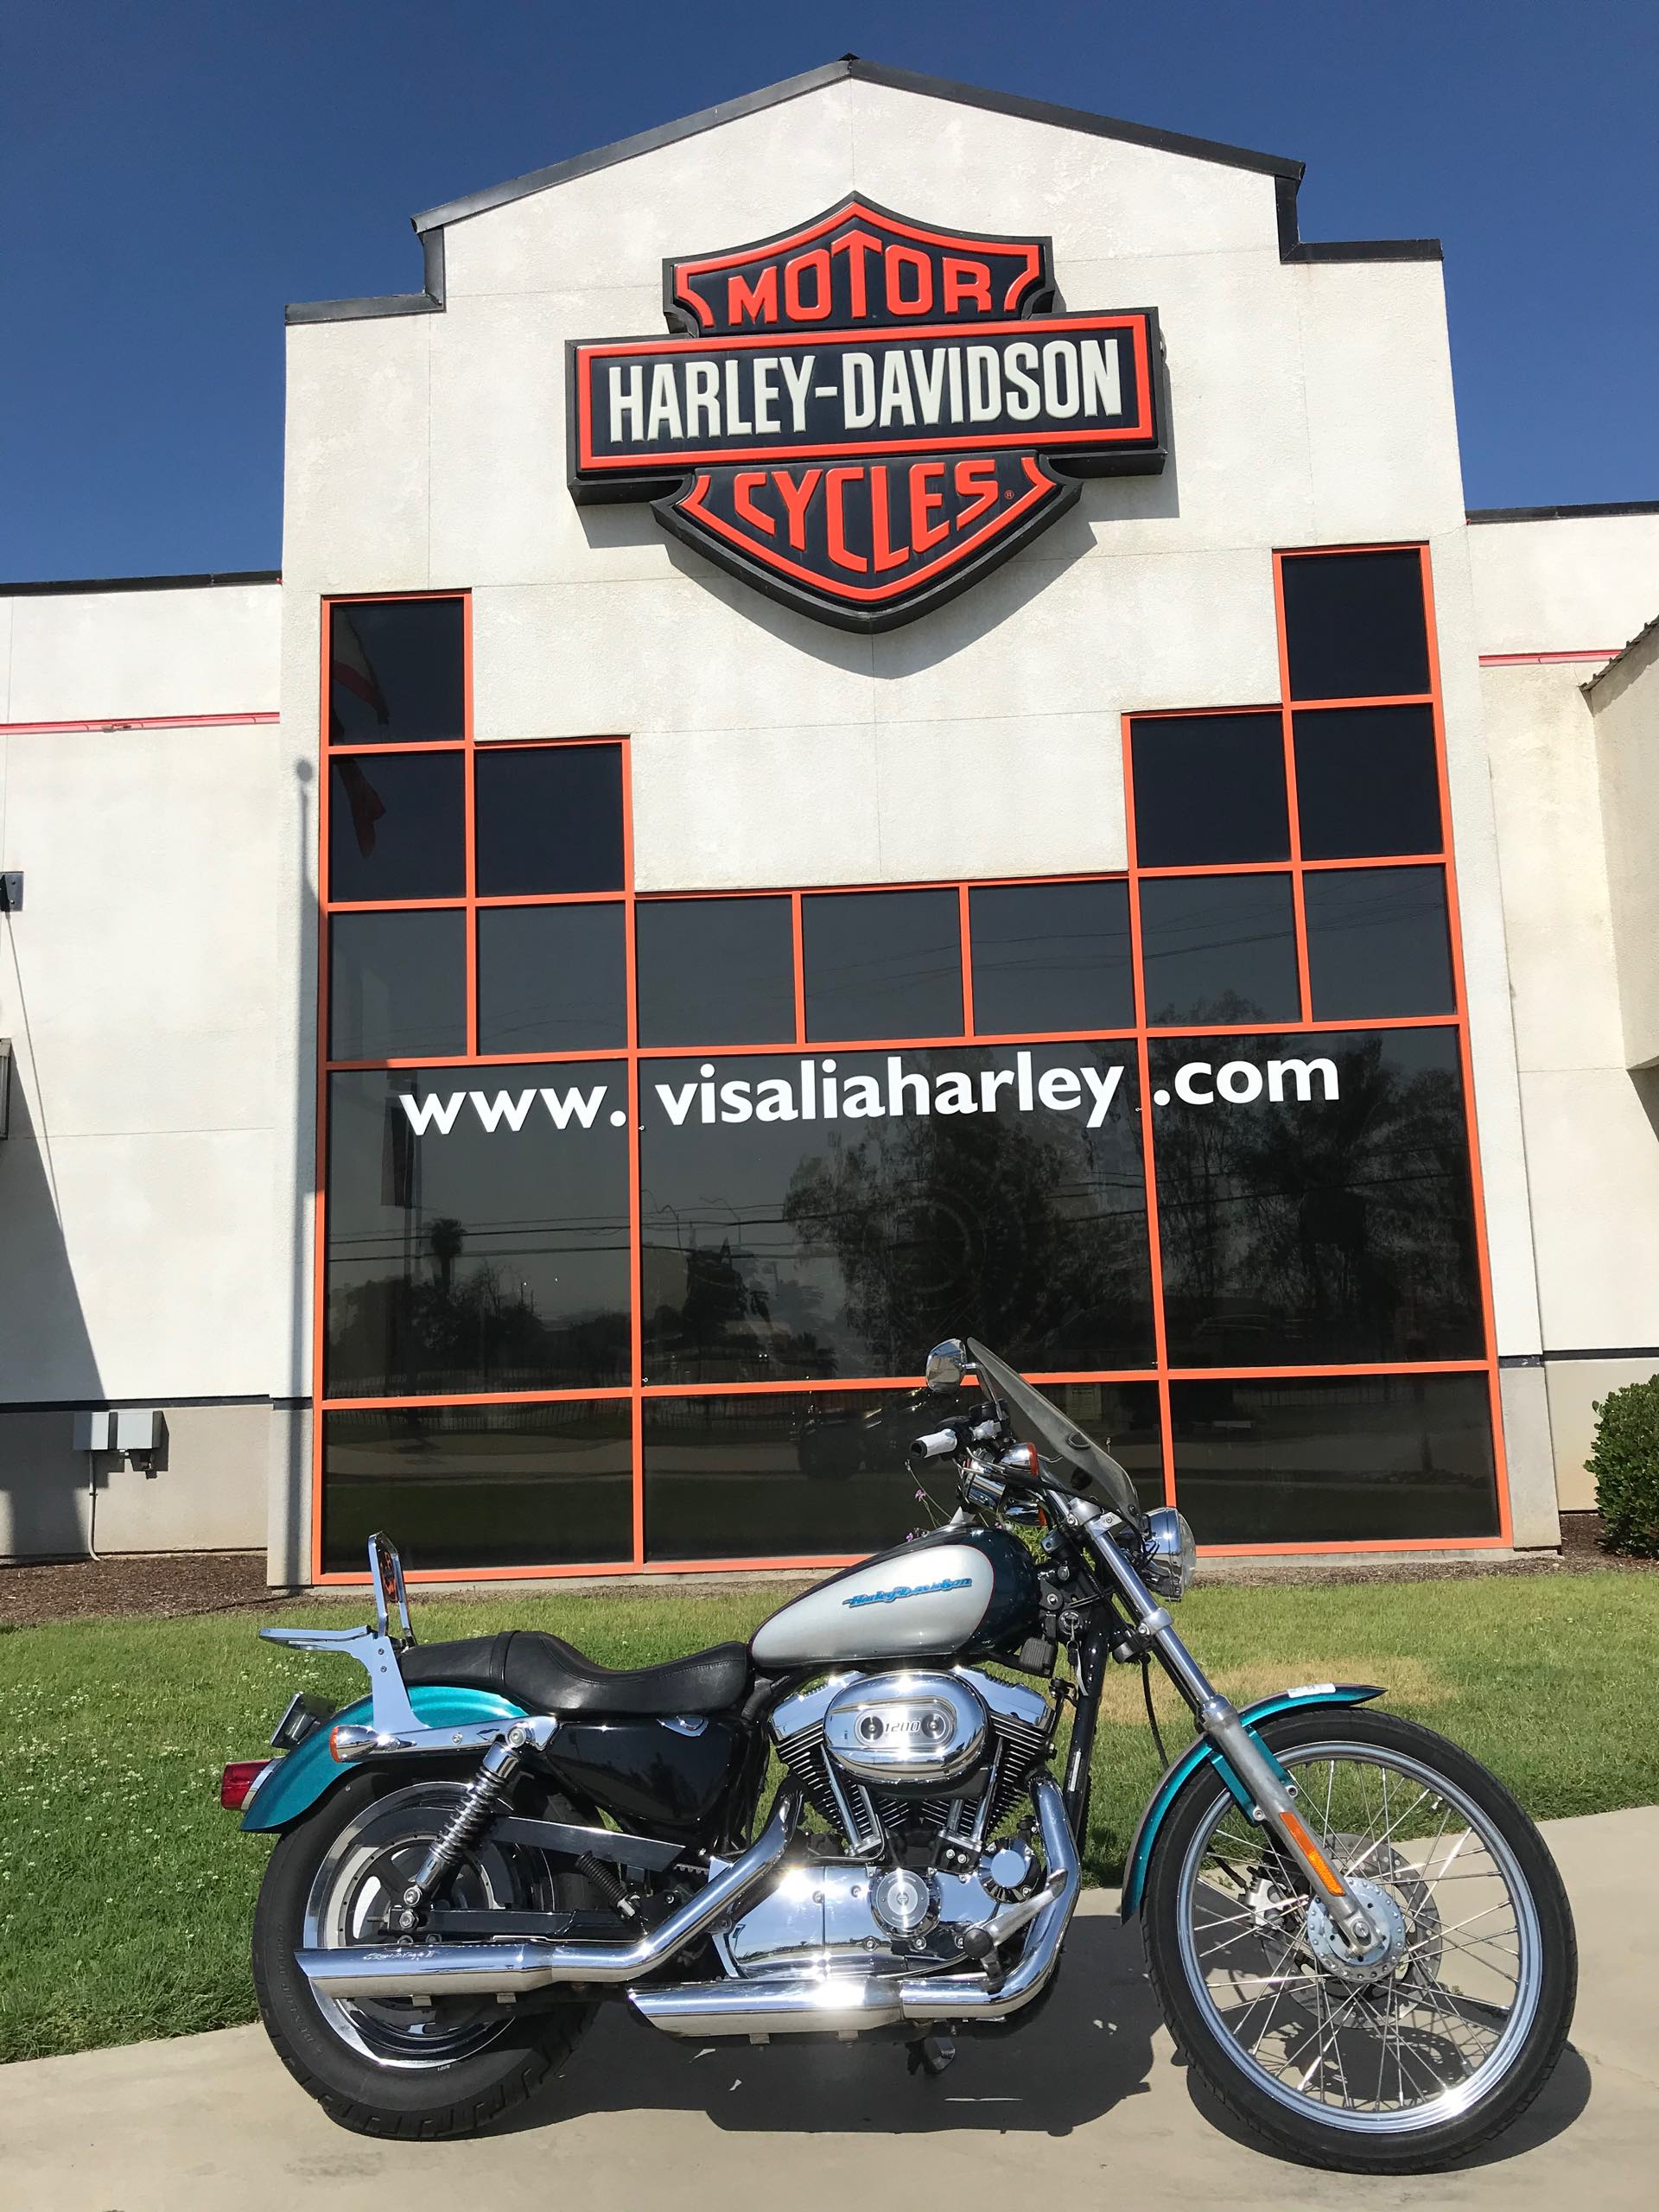 2004 Harley-Davidson Sportster 1200 Custom at Visalia Harley-Davidson